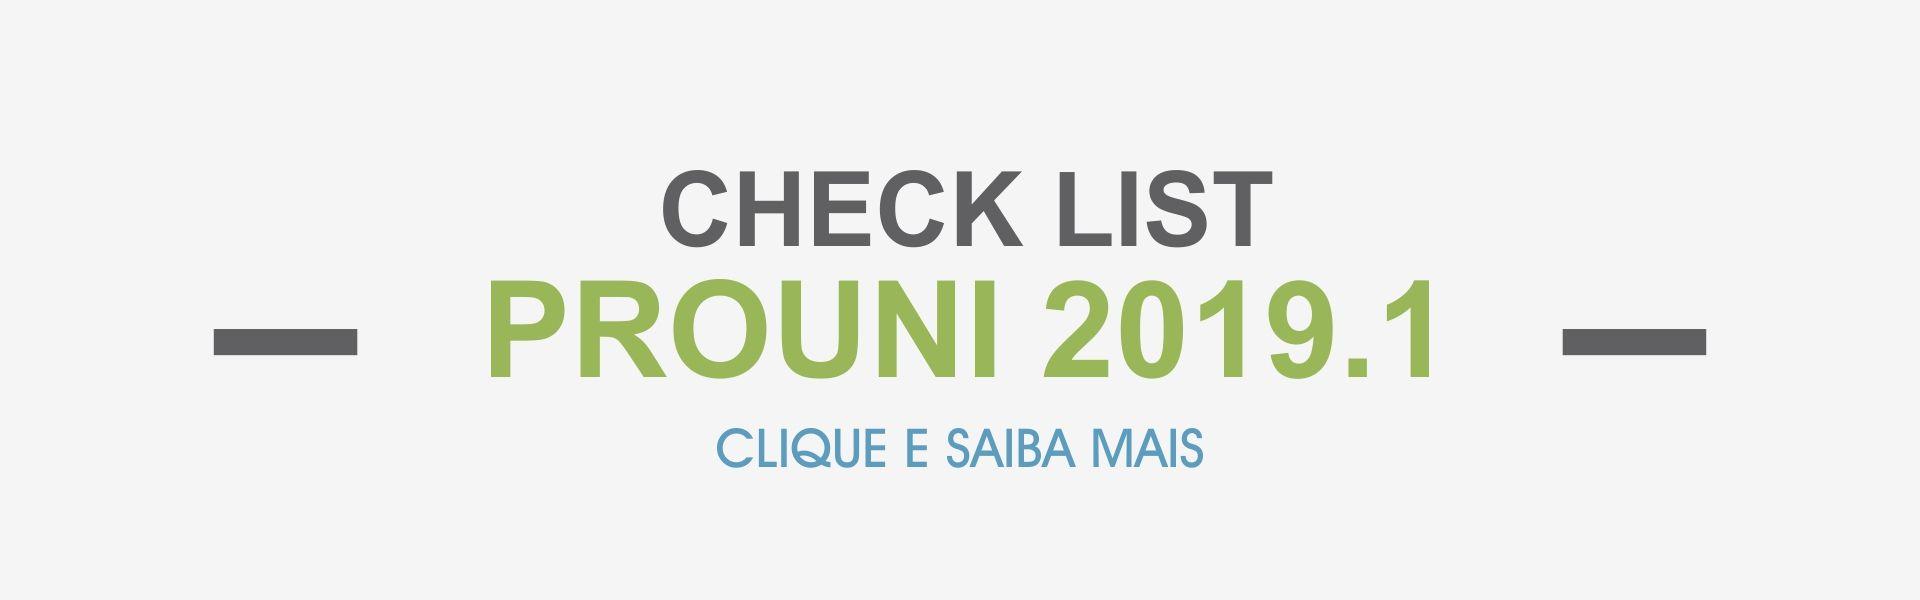 prouni check list